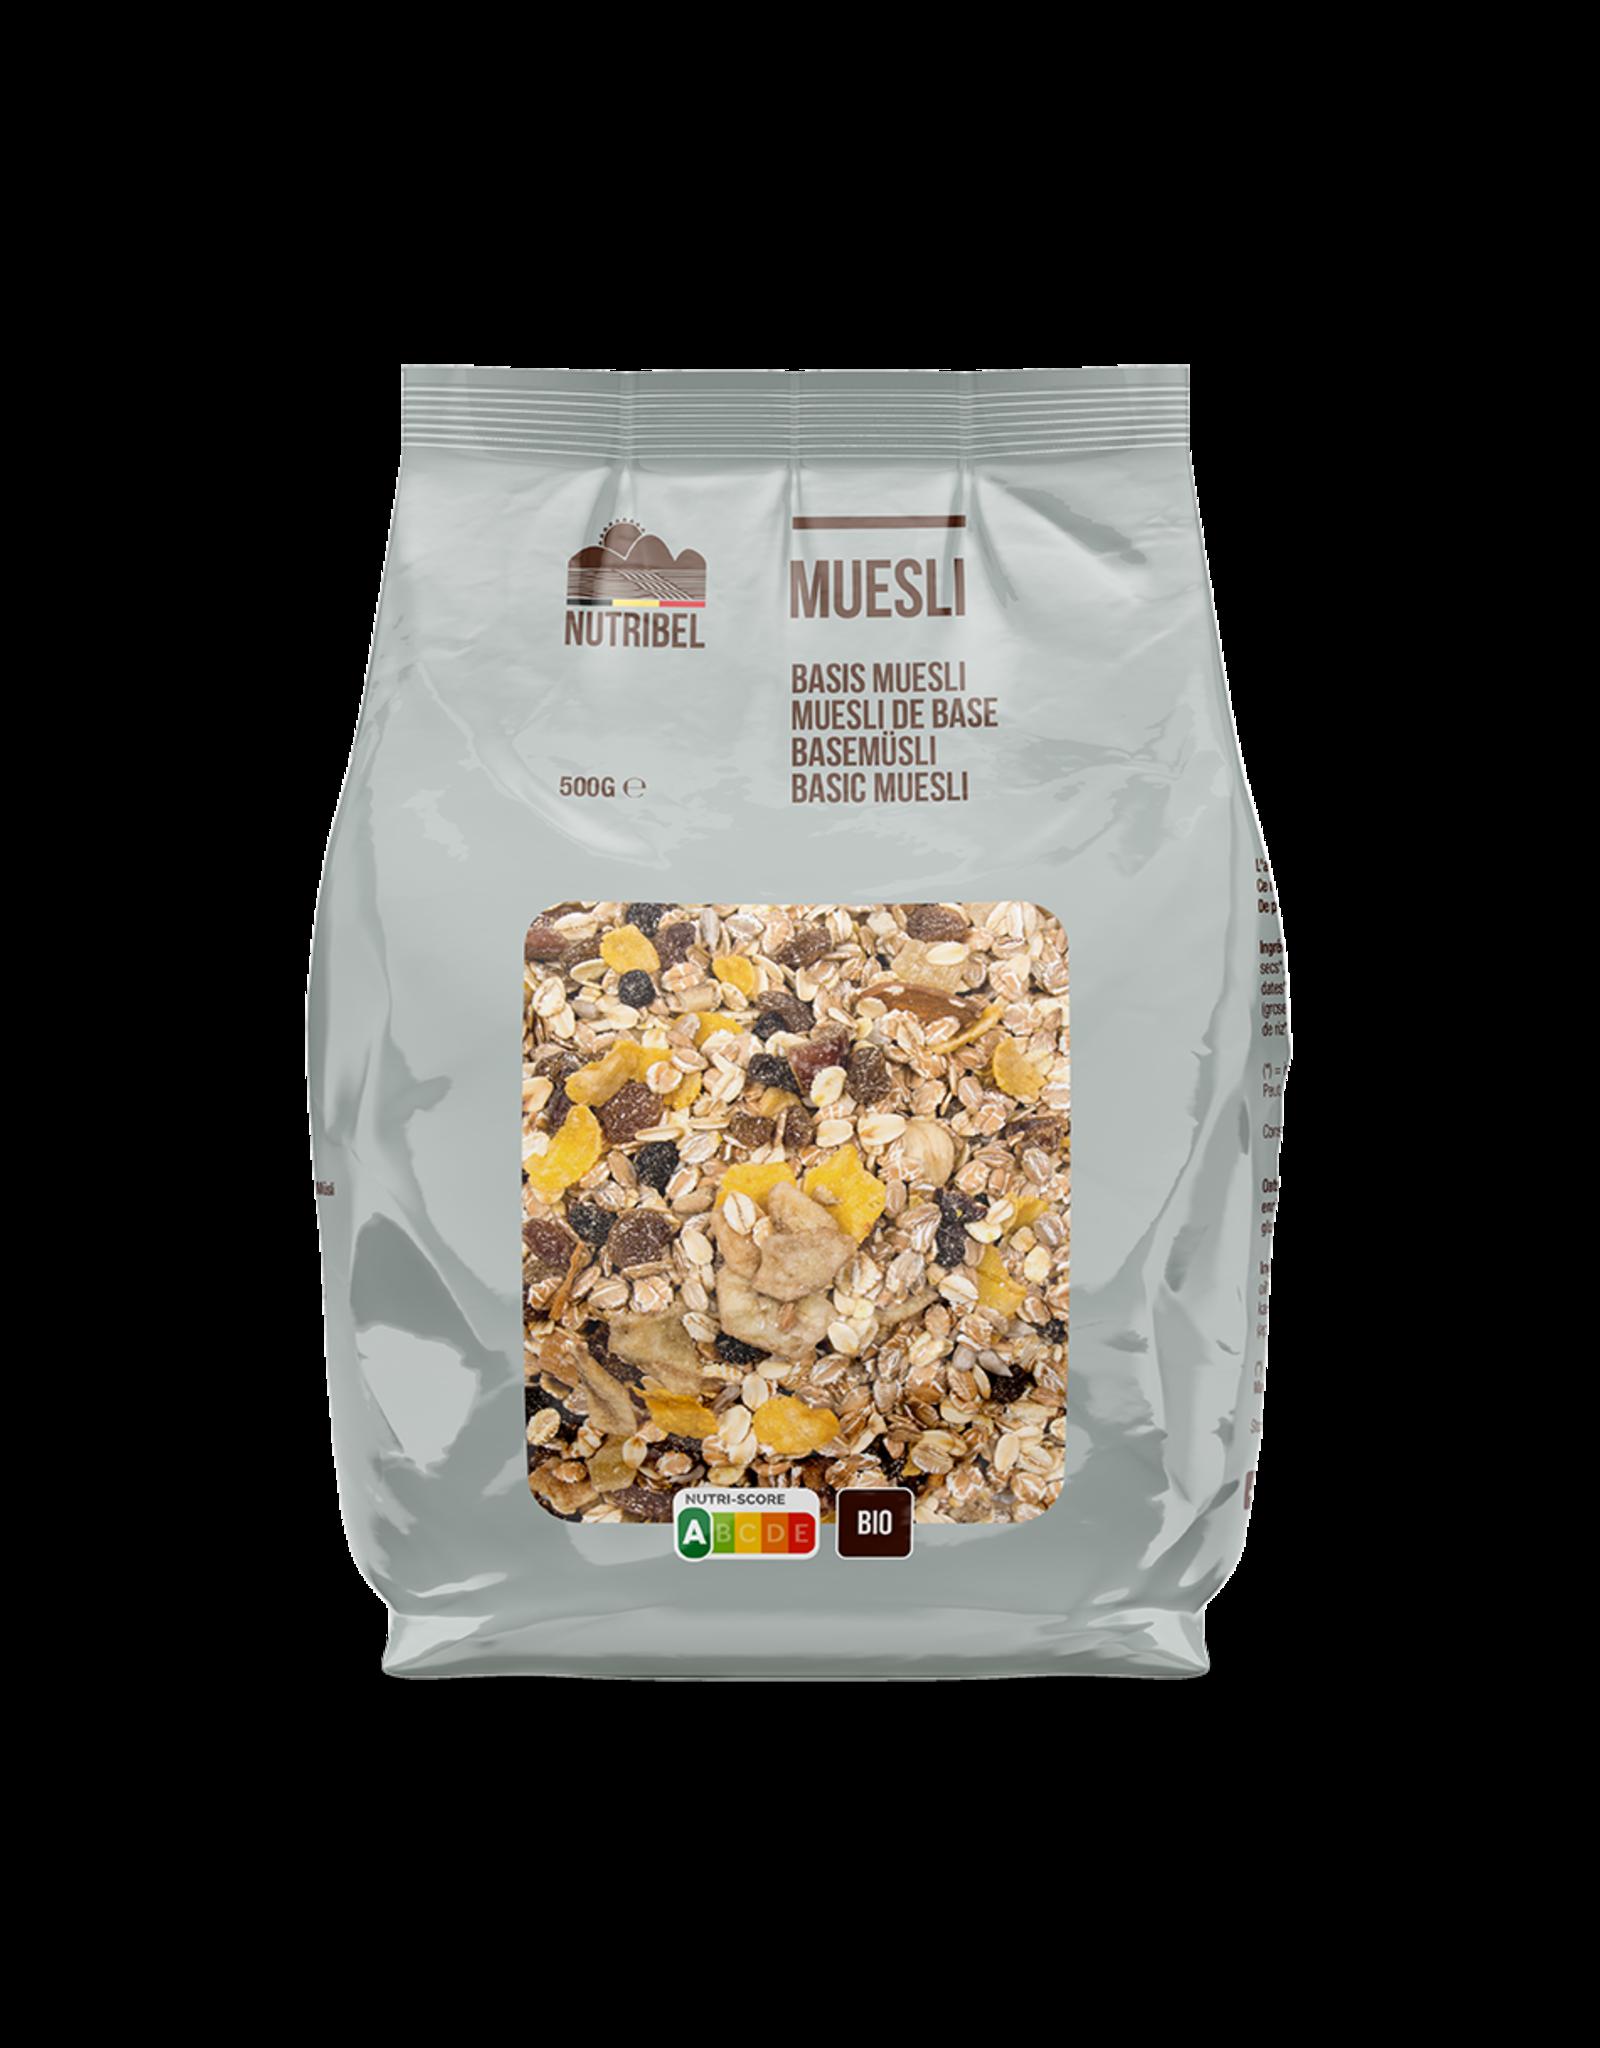 Nutribel Muesli basis bio 500g